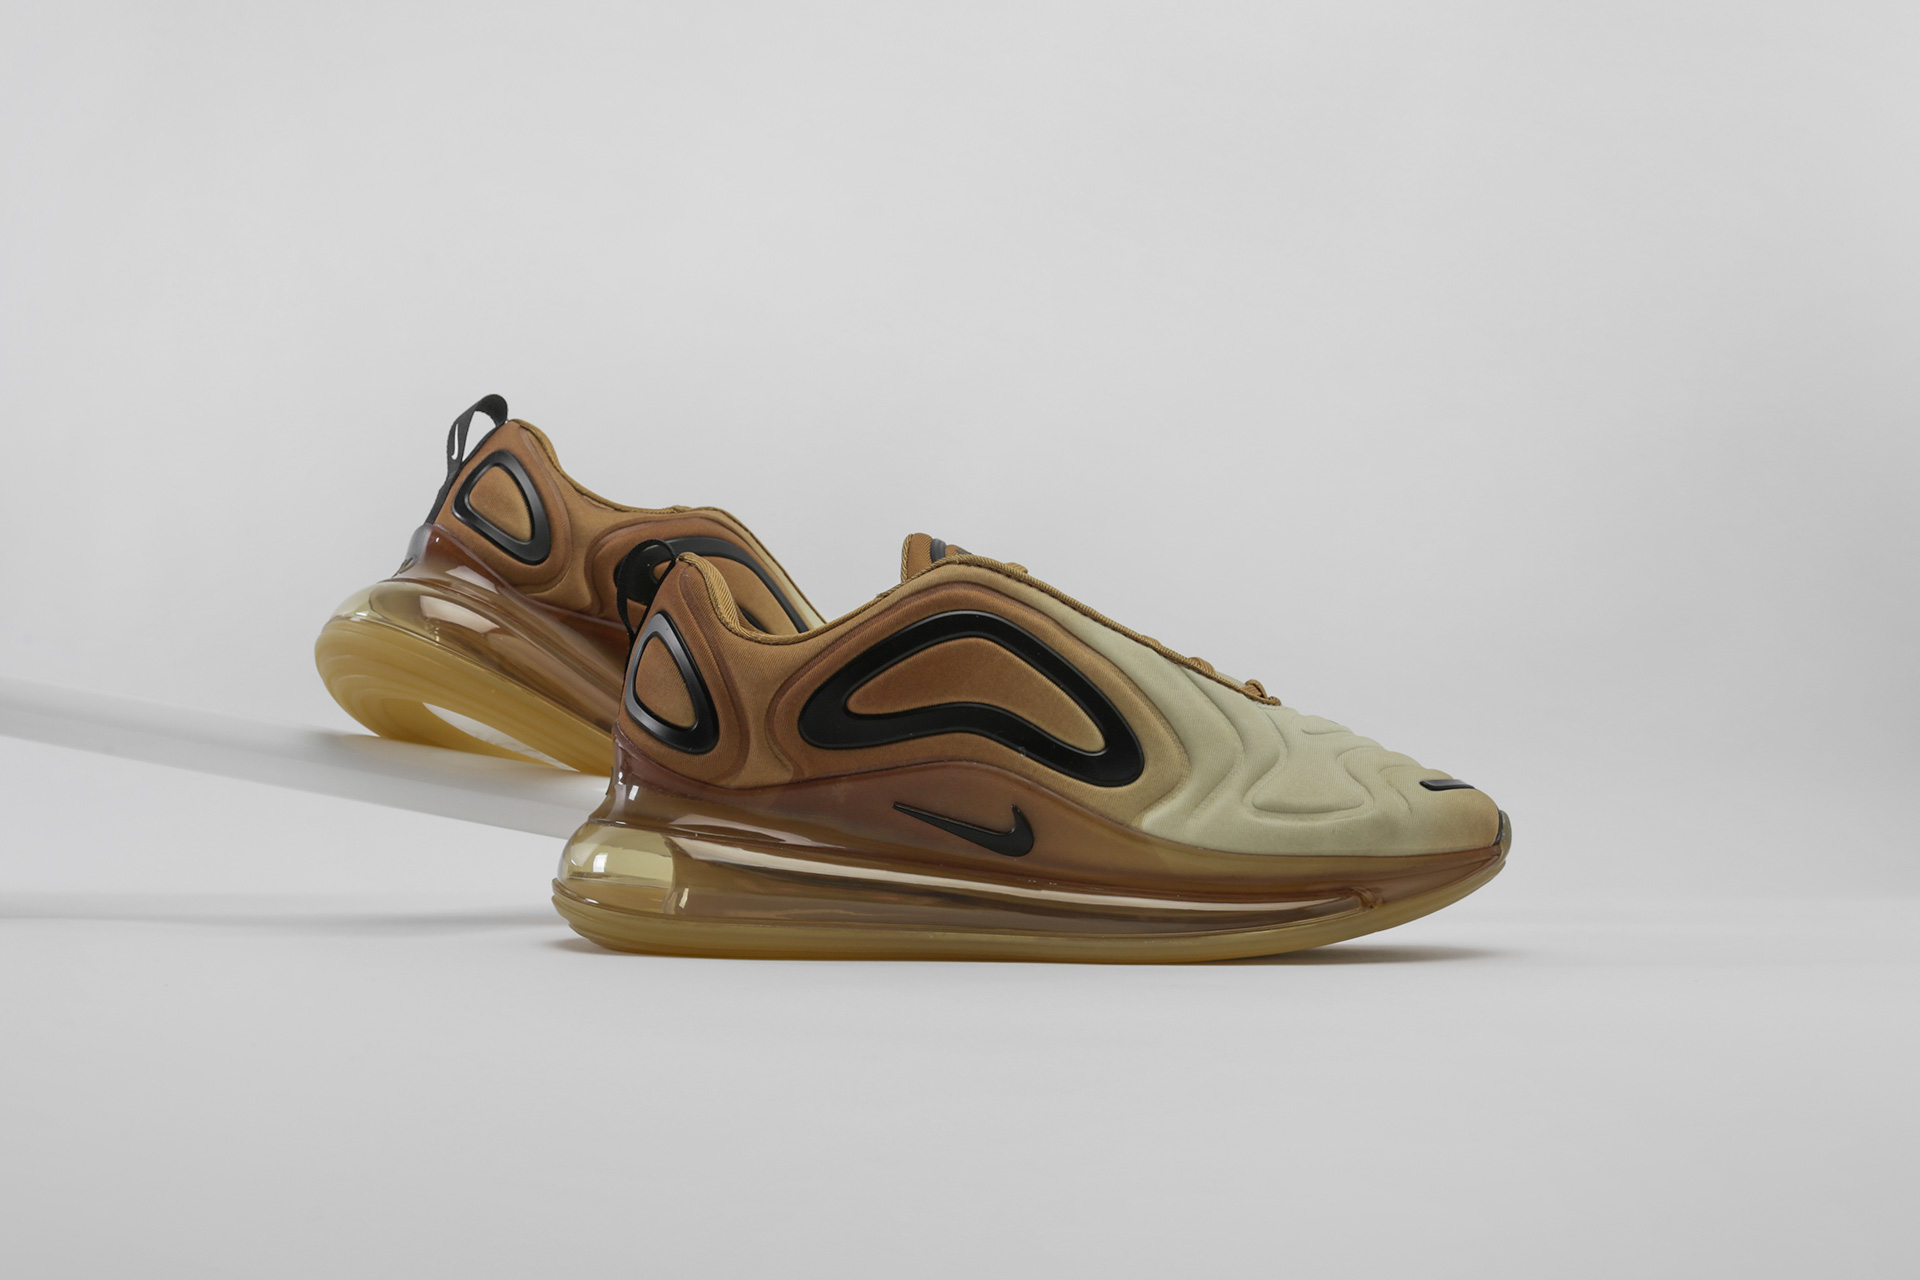 cd662e80e83c2 Купить бежевые мужские кроссовки Air Max 720 от Nike (AO2924-700) по ...